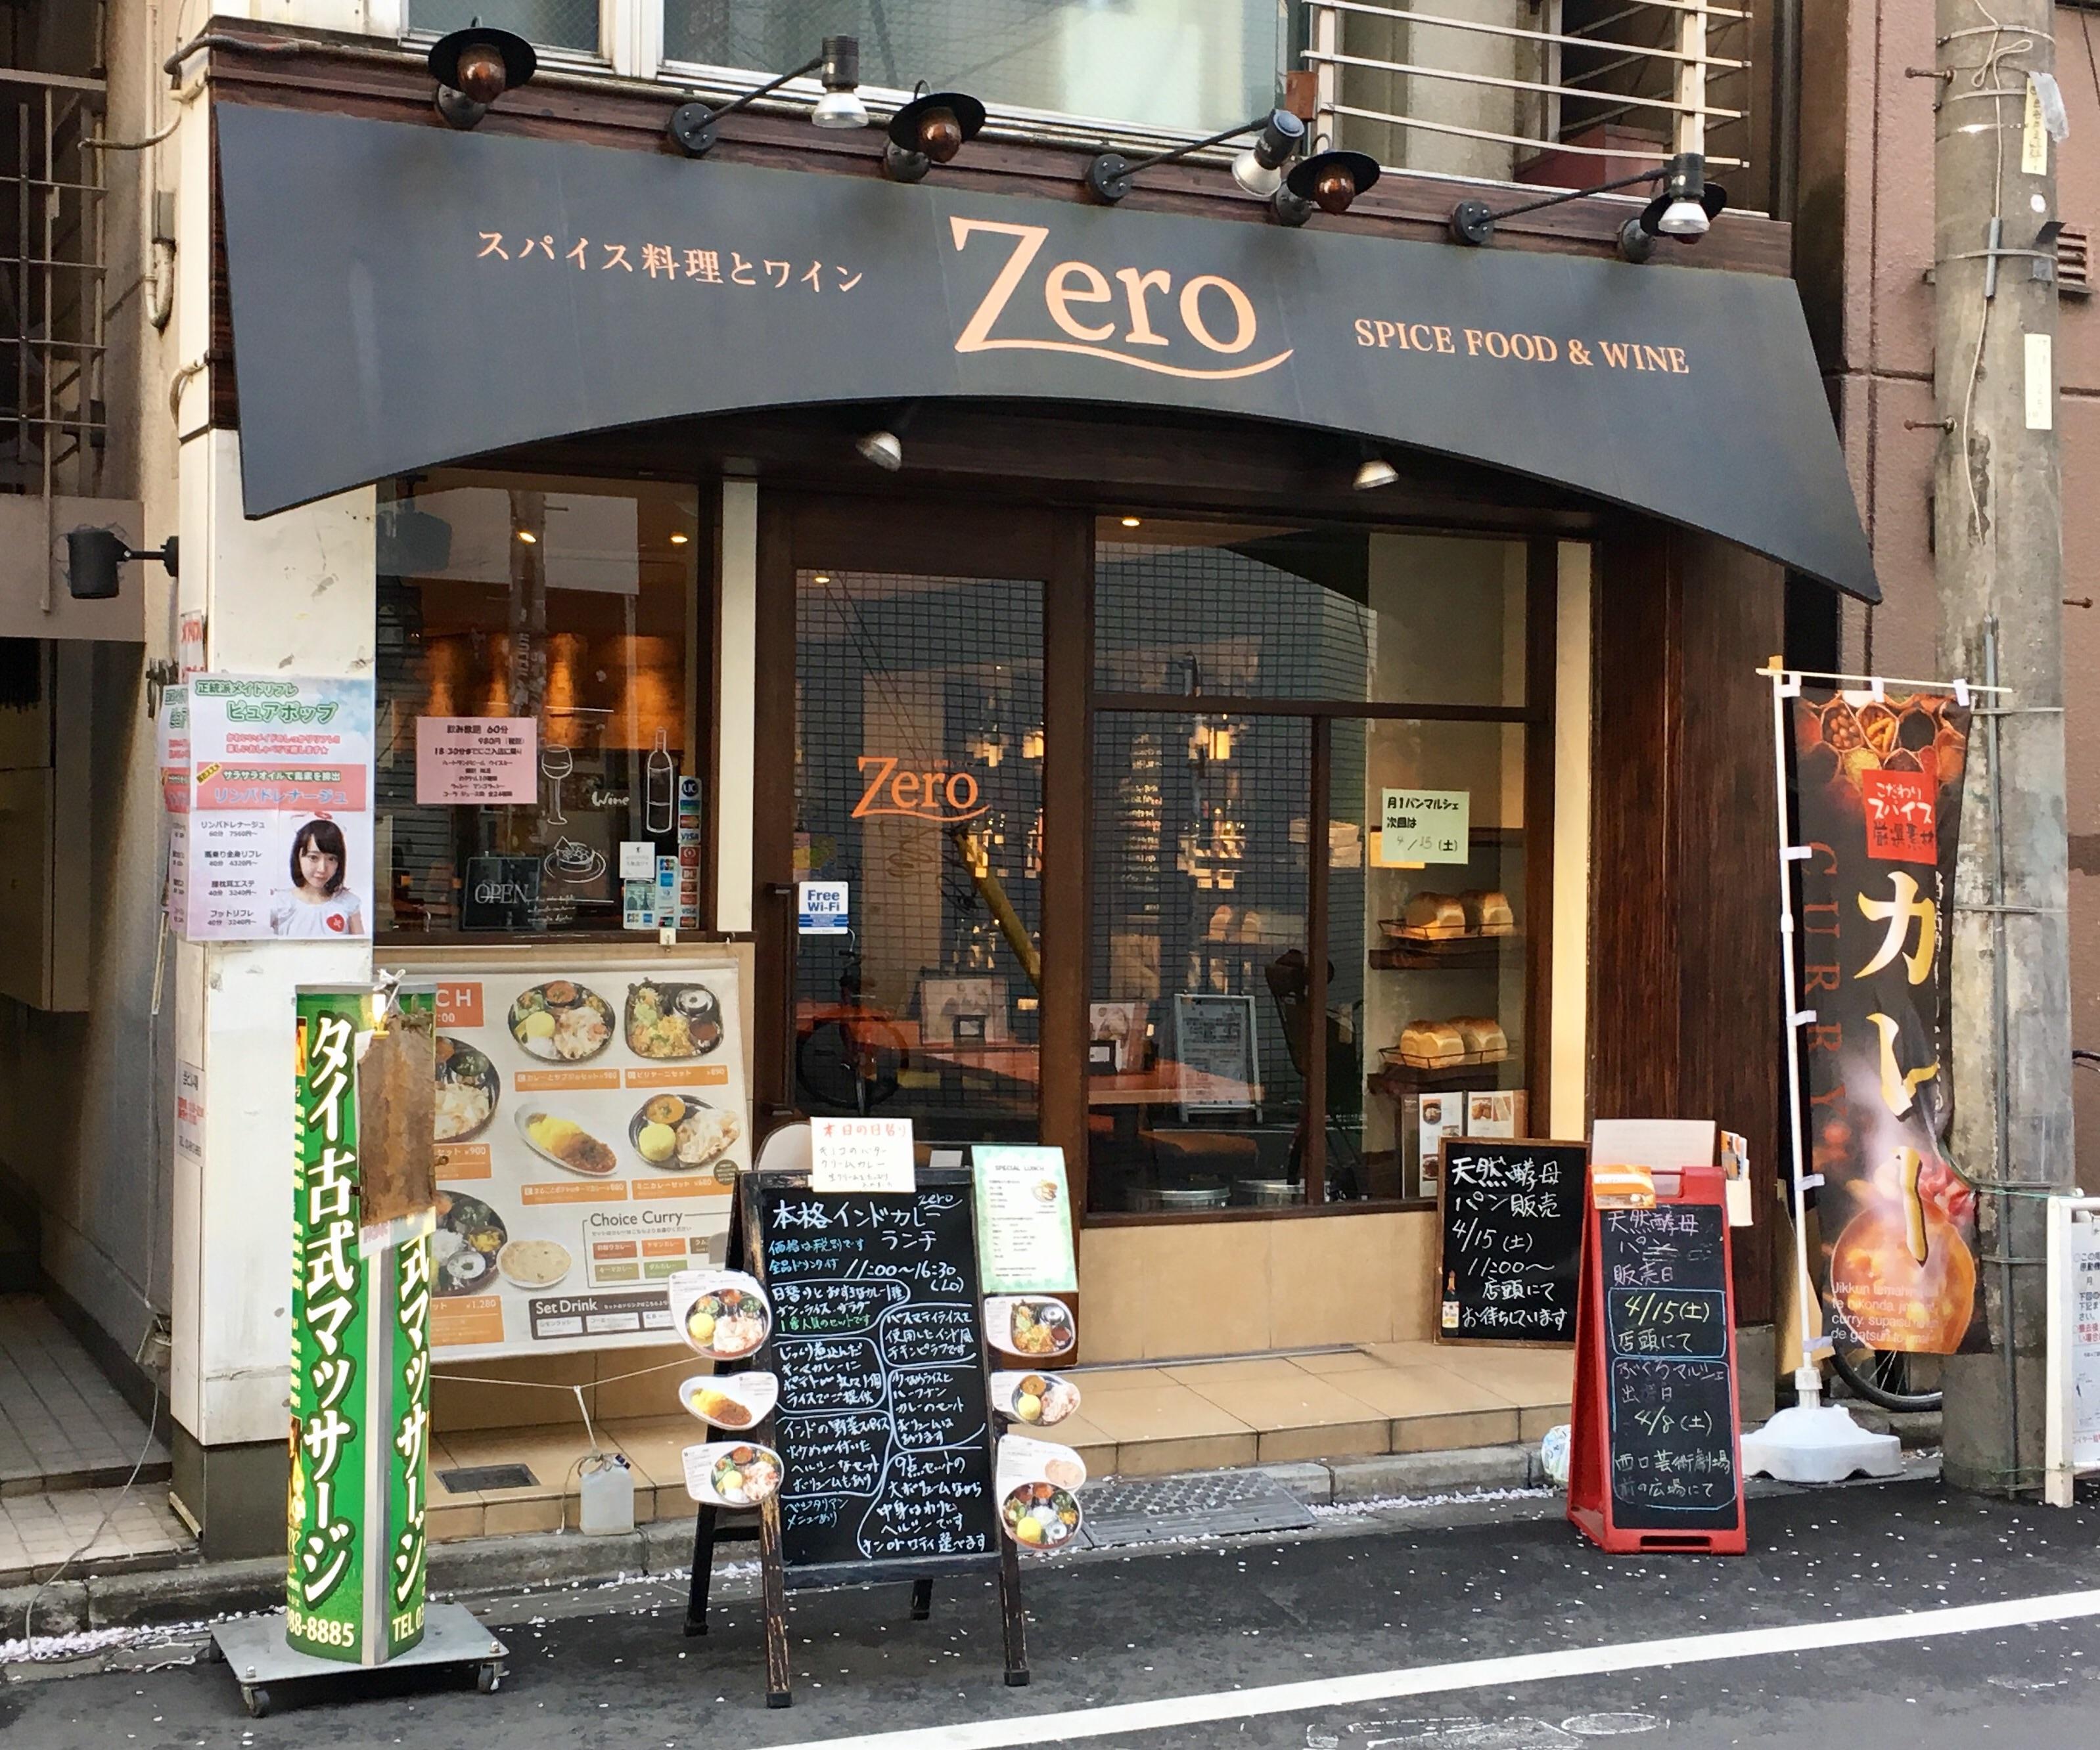 f:id:SoichiroIkeshita:20170407234528j:image